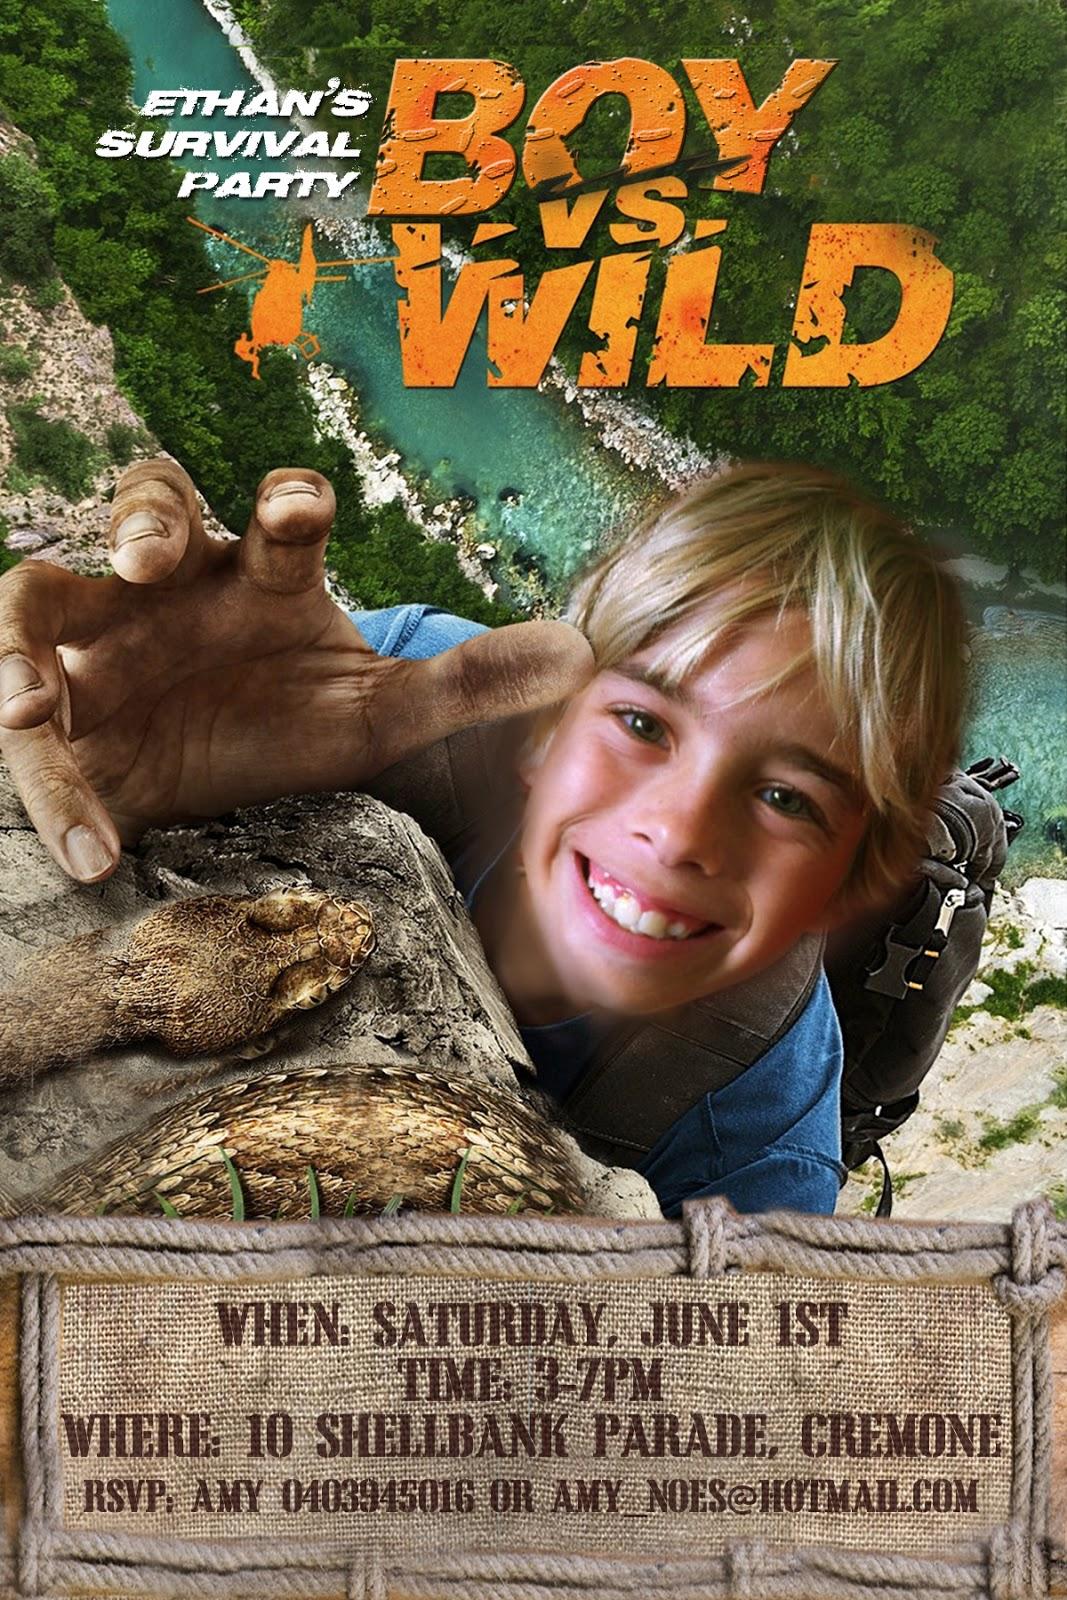 Free Kids Party Invitations Boy Vs Wild Bear Grylls